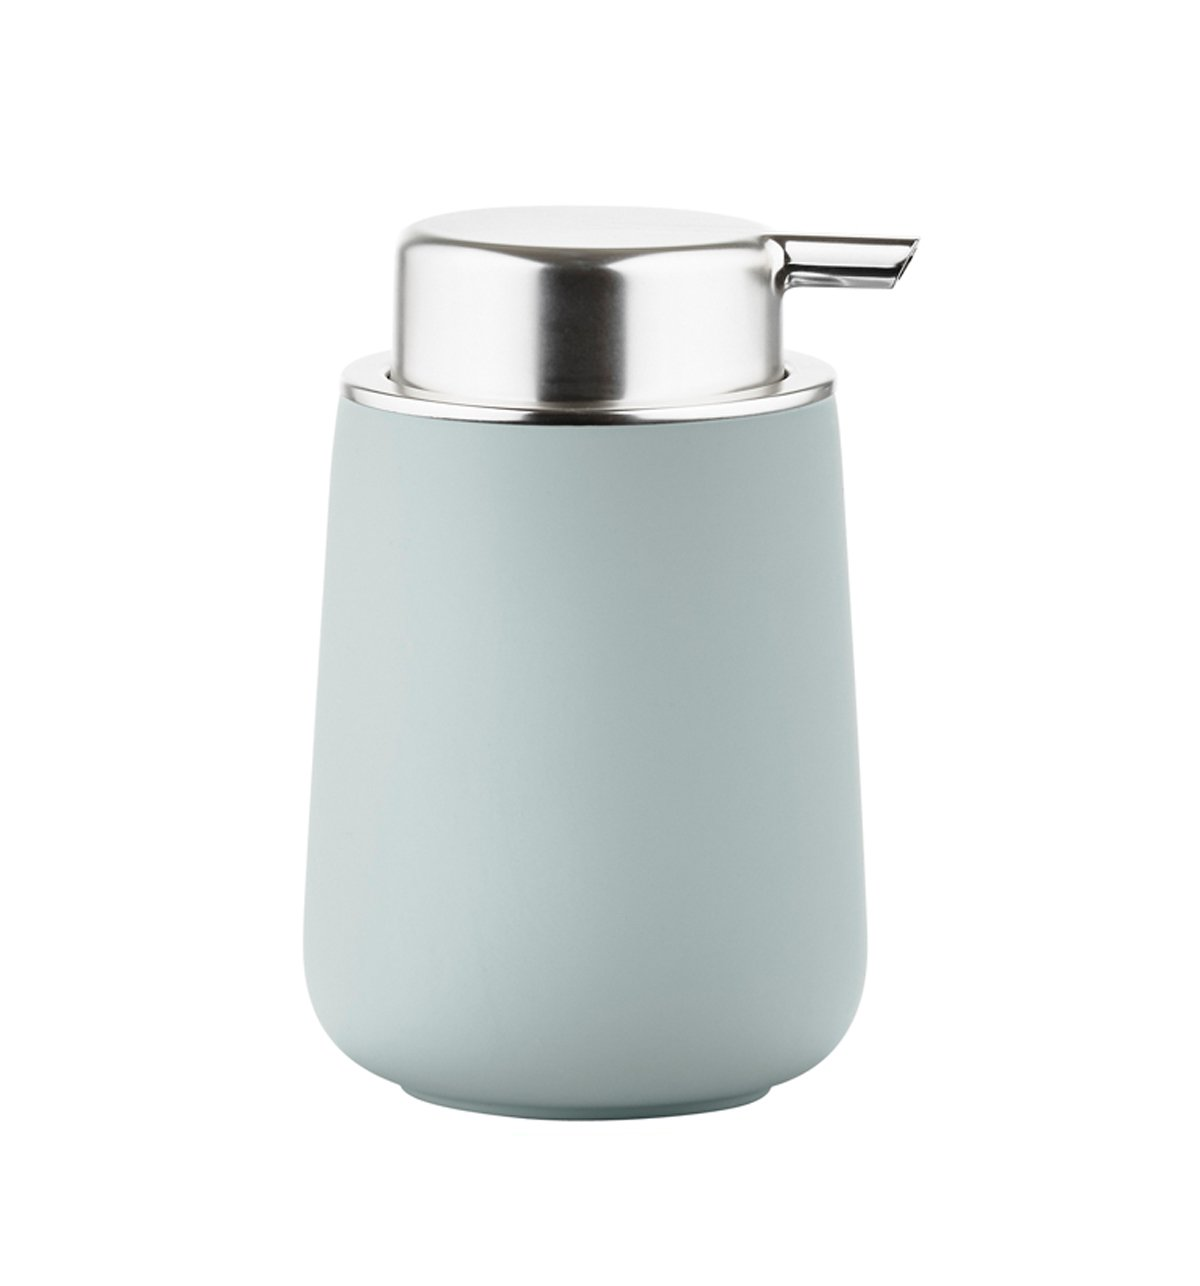 Zone - Nova Soap Dispenzer - Dusty Green (330122)